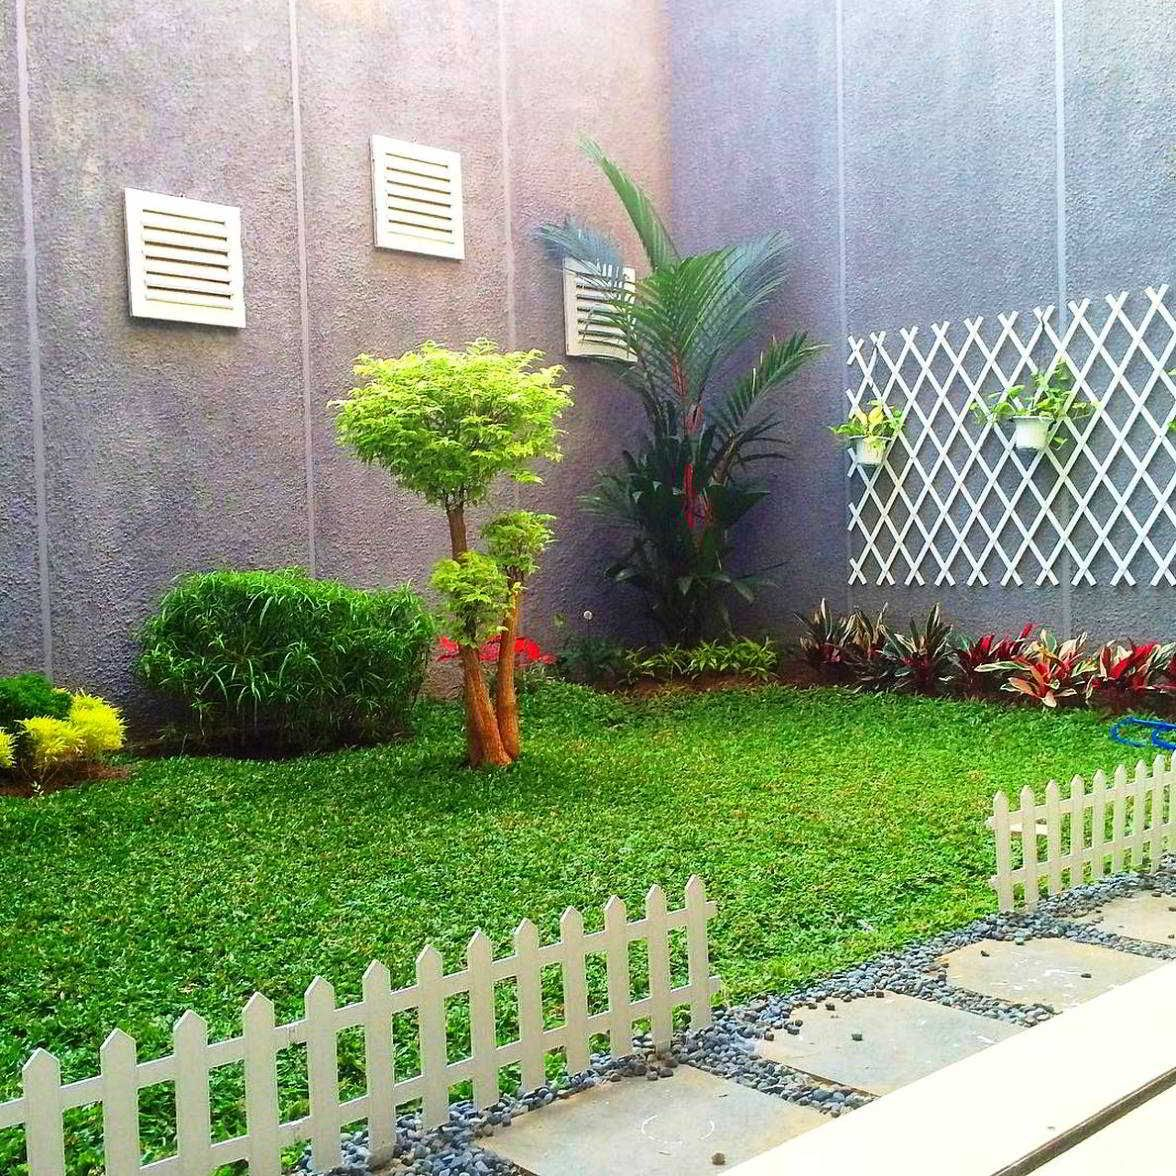 Desain Taman Minimalis Ala Jepang Vidya Titip Desain